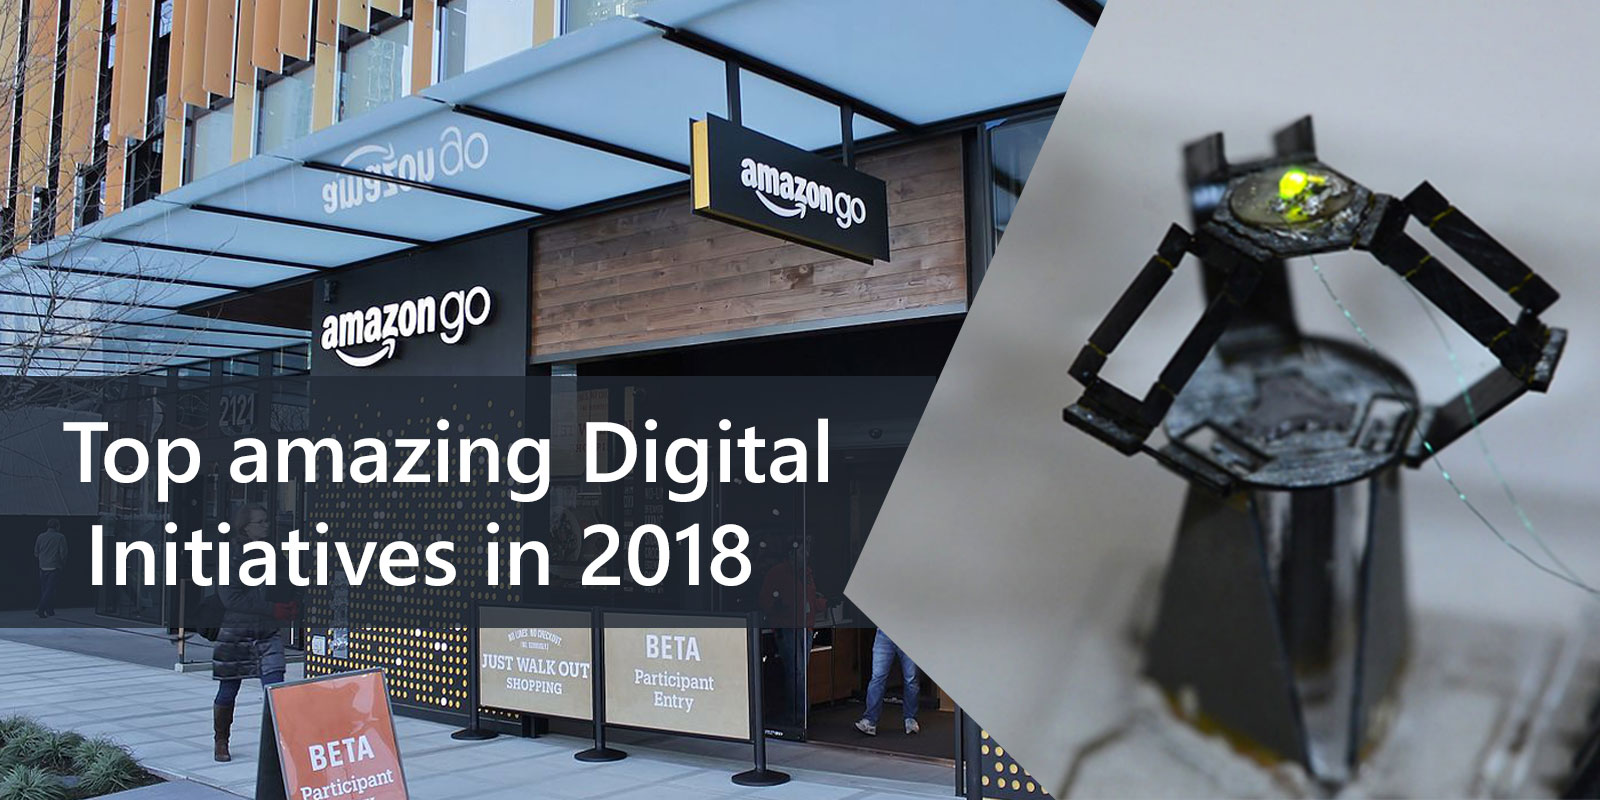 Top amazing Digital Initiatives in 2018 - Image 1